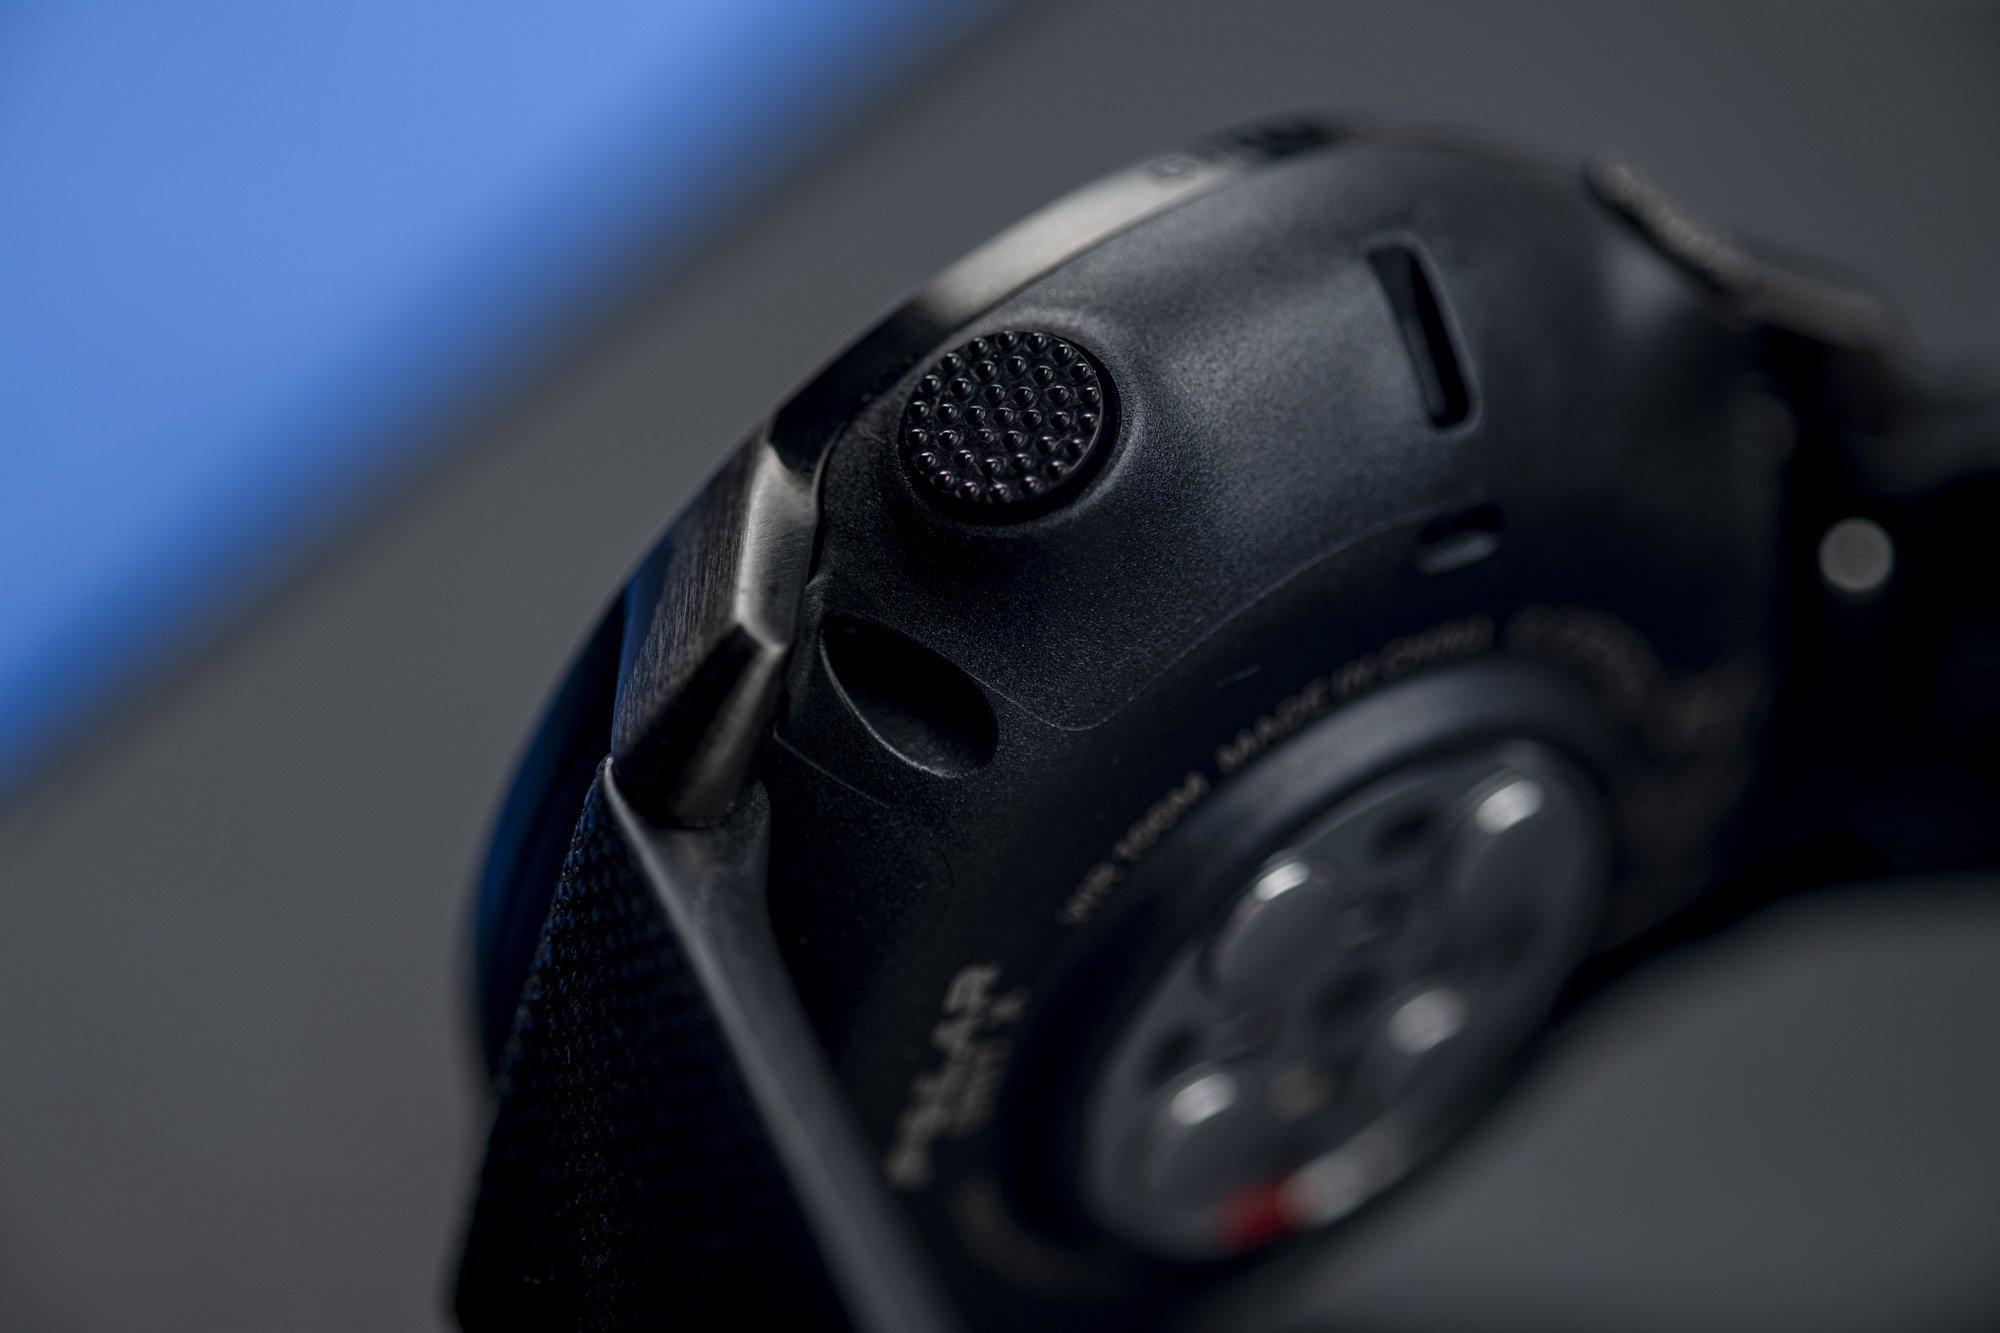 fonction Polar Grit X Review sport watch photography Jose Jeuland blog training